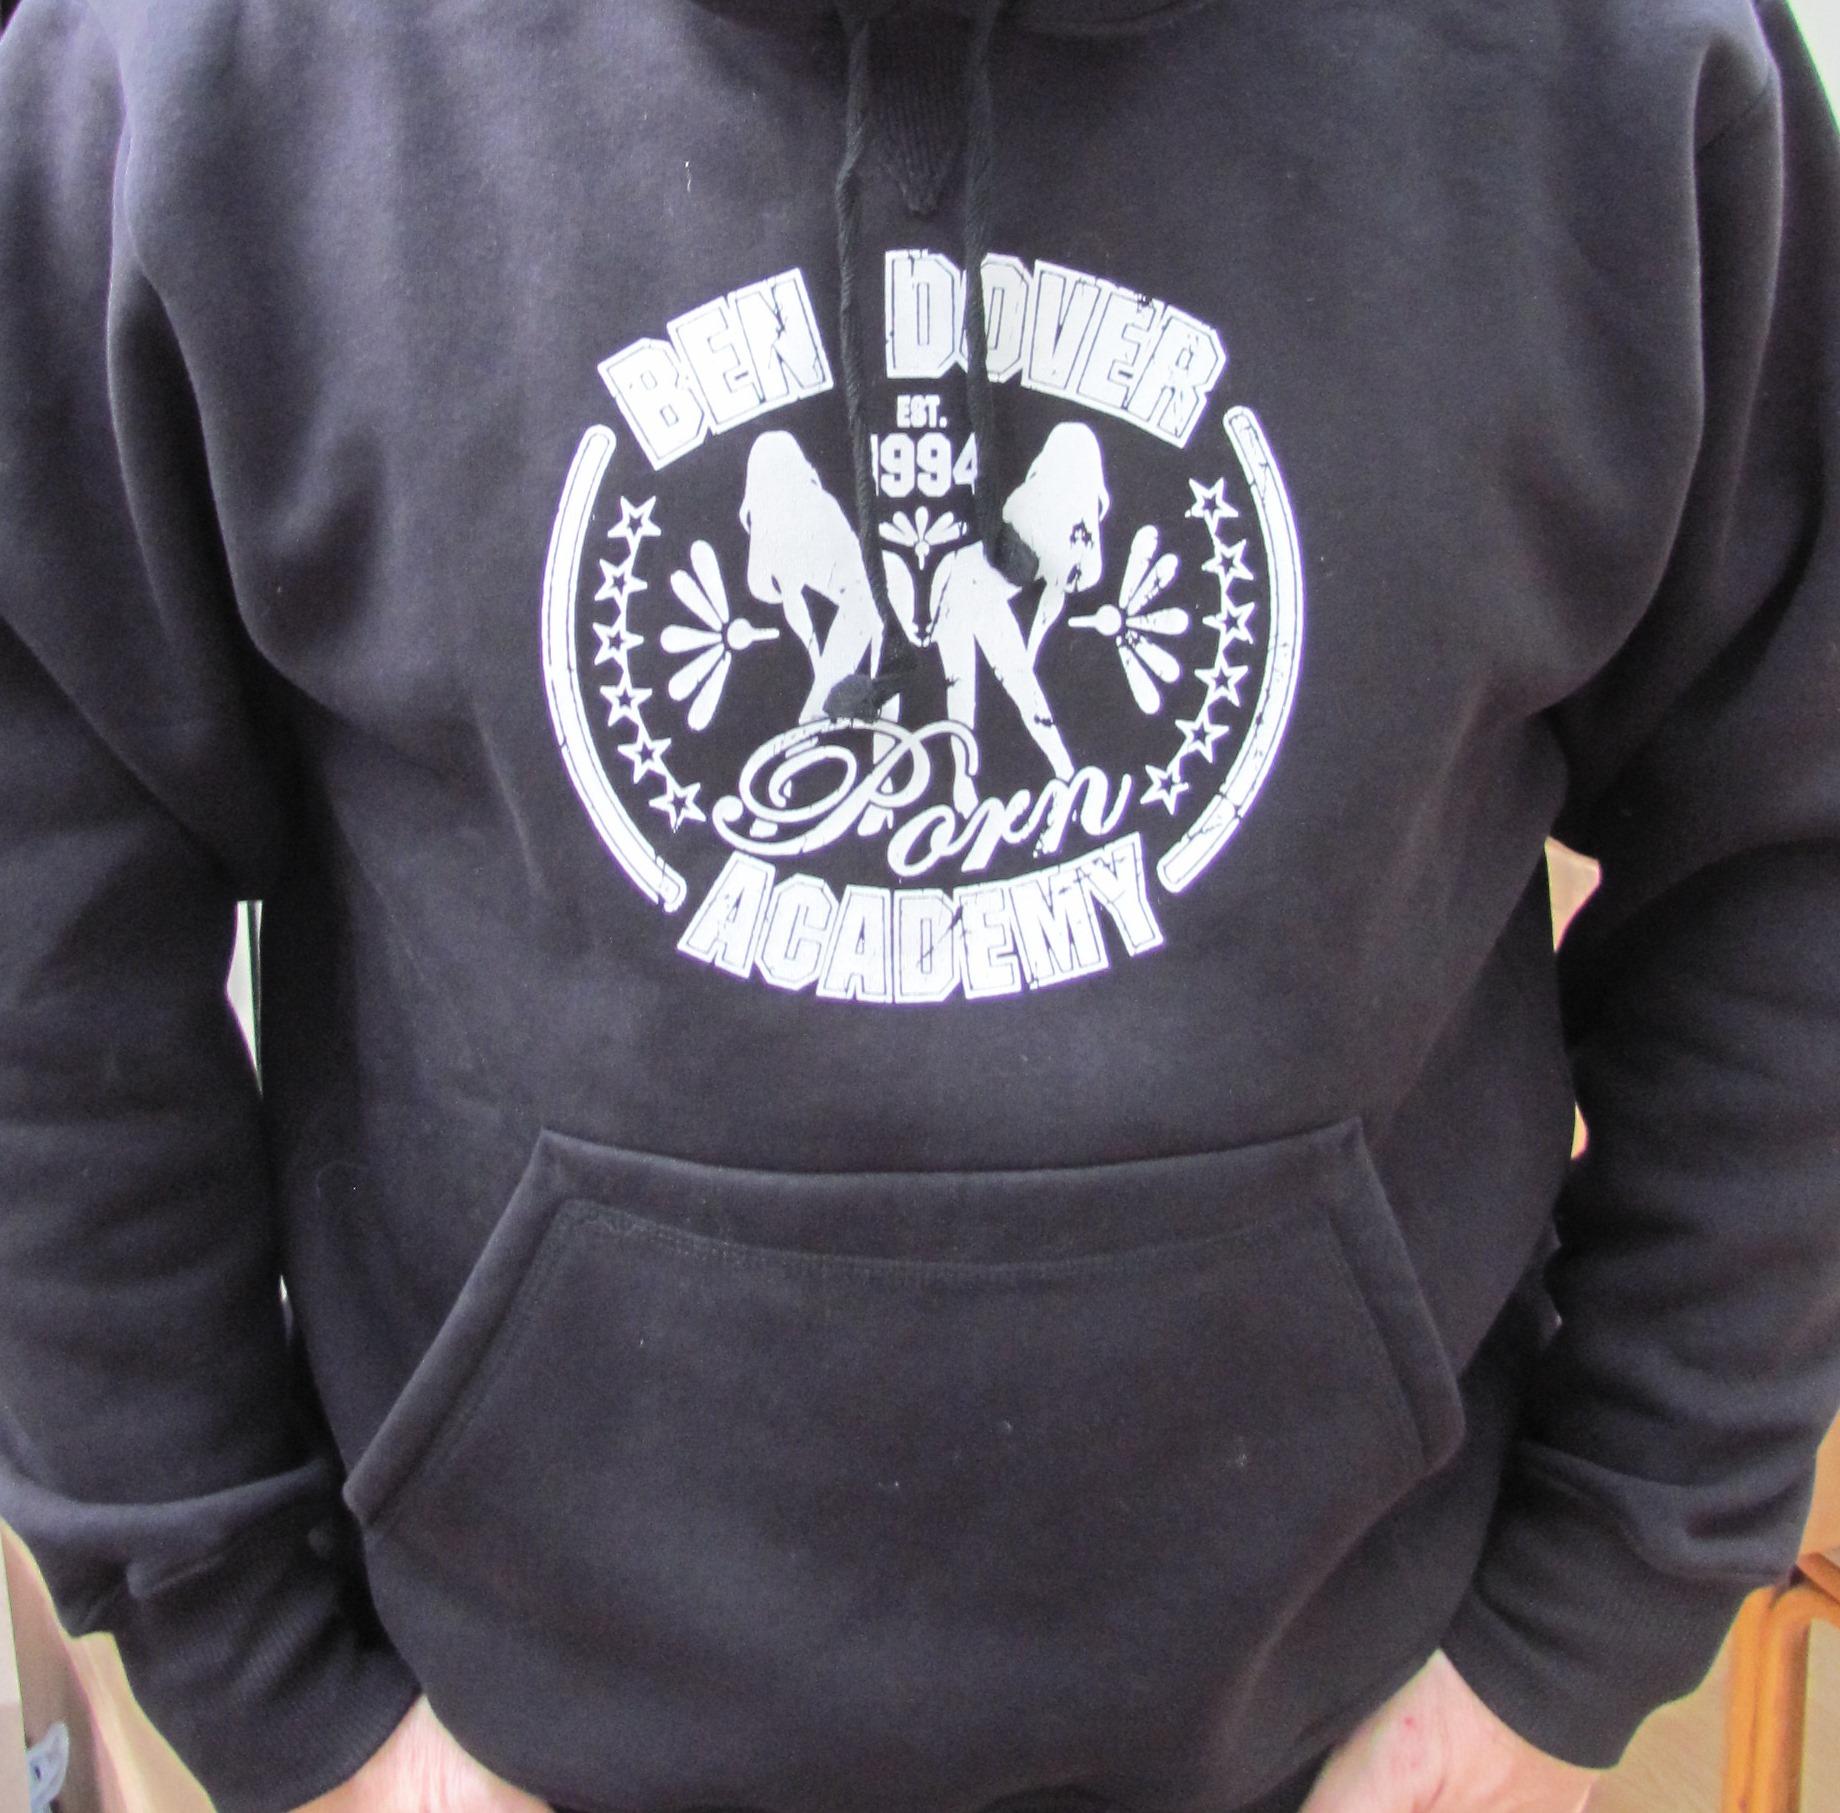 52 x Ben Dover Hoodies Sweat shirts 100% Cotton . S M L. RRP £2079.48